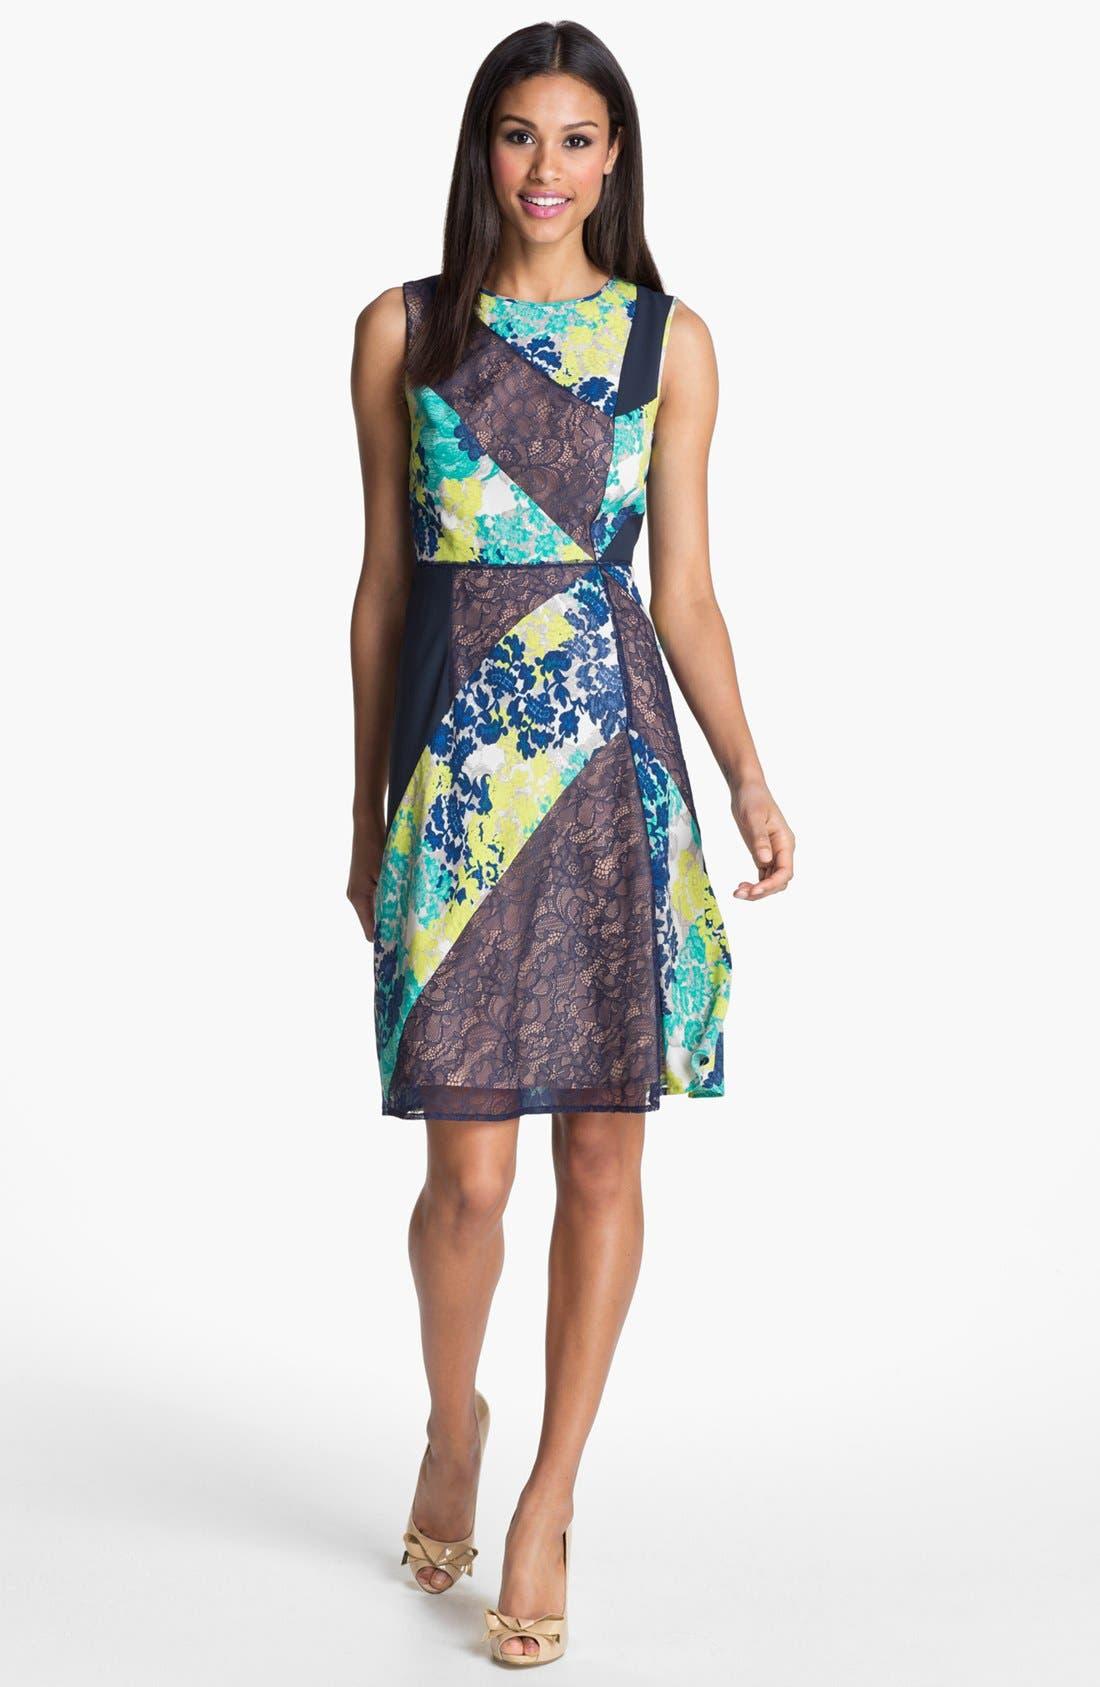 Alternate Image 1 Selected - BCBGMAXAZRIA Mixed Print & Lace Sheath Dress